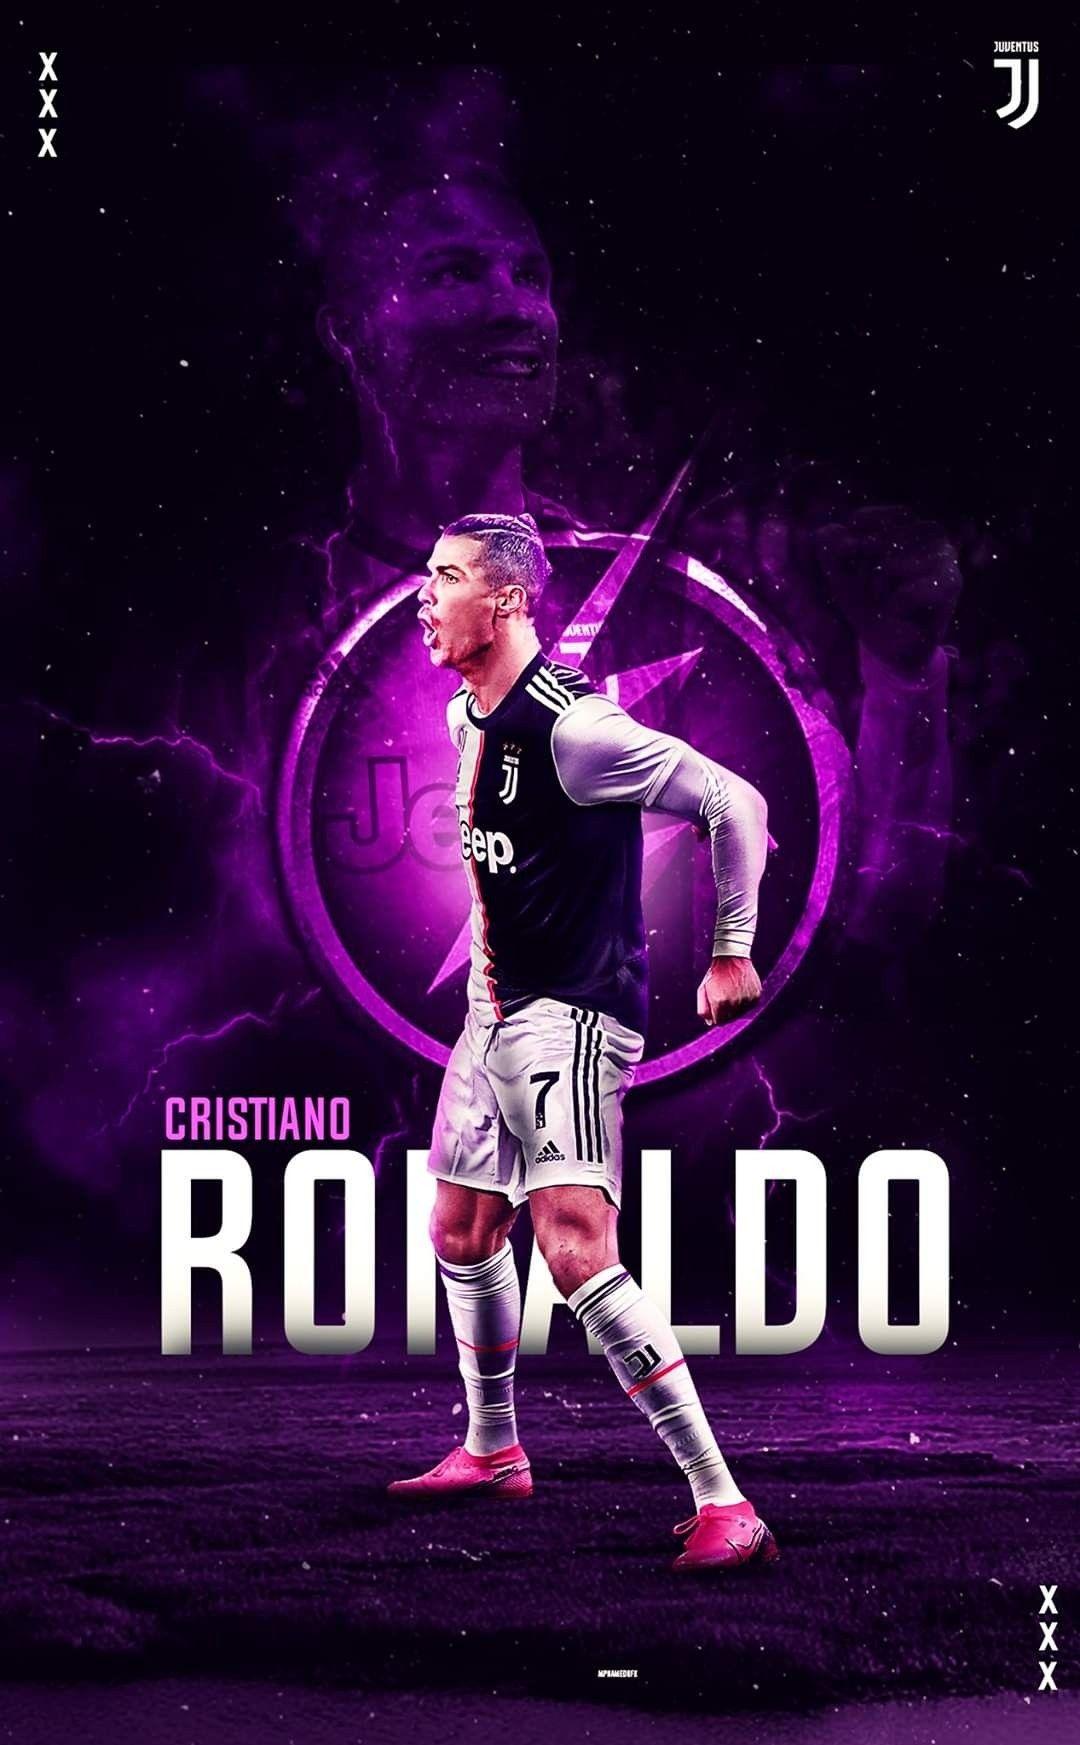 ronaldo, wallpapers, photography, cristiano ronaldo, celebrity wallpaper